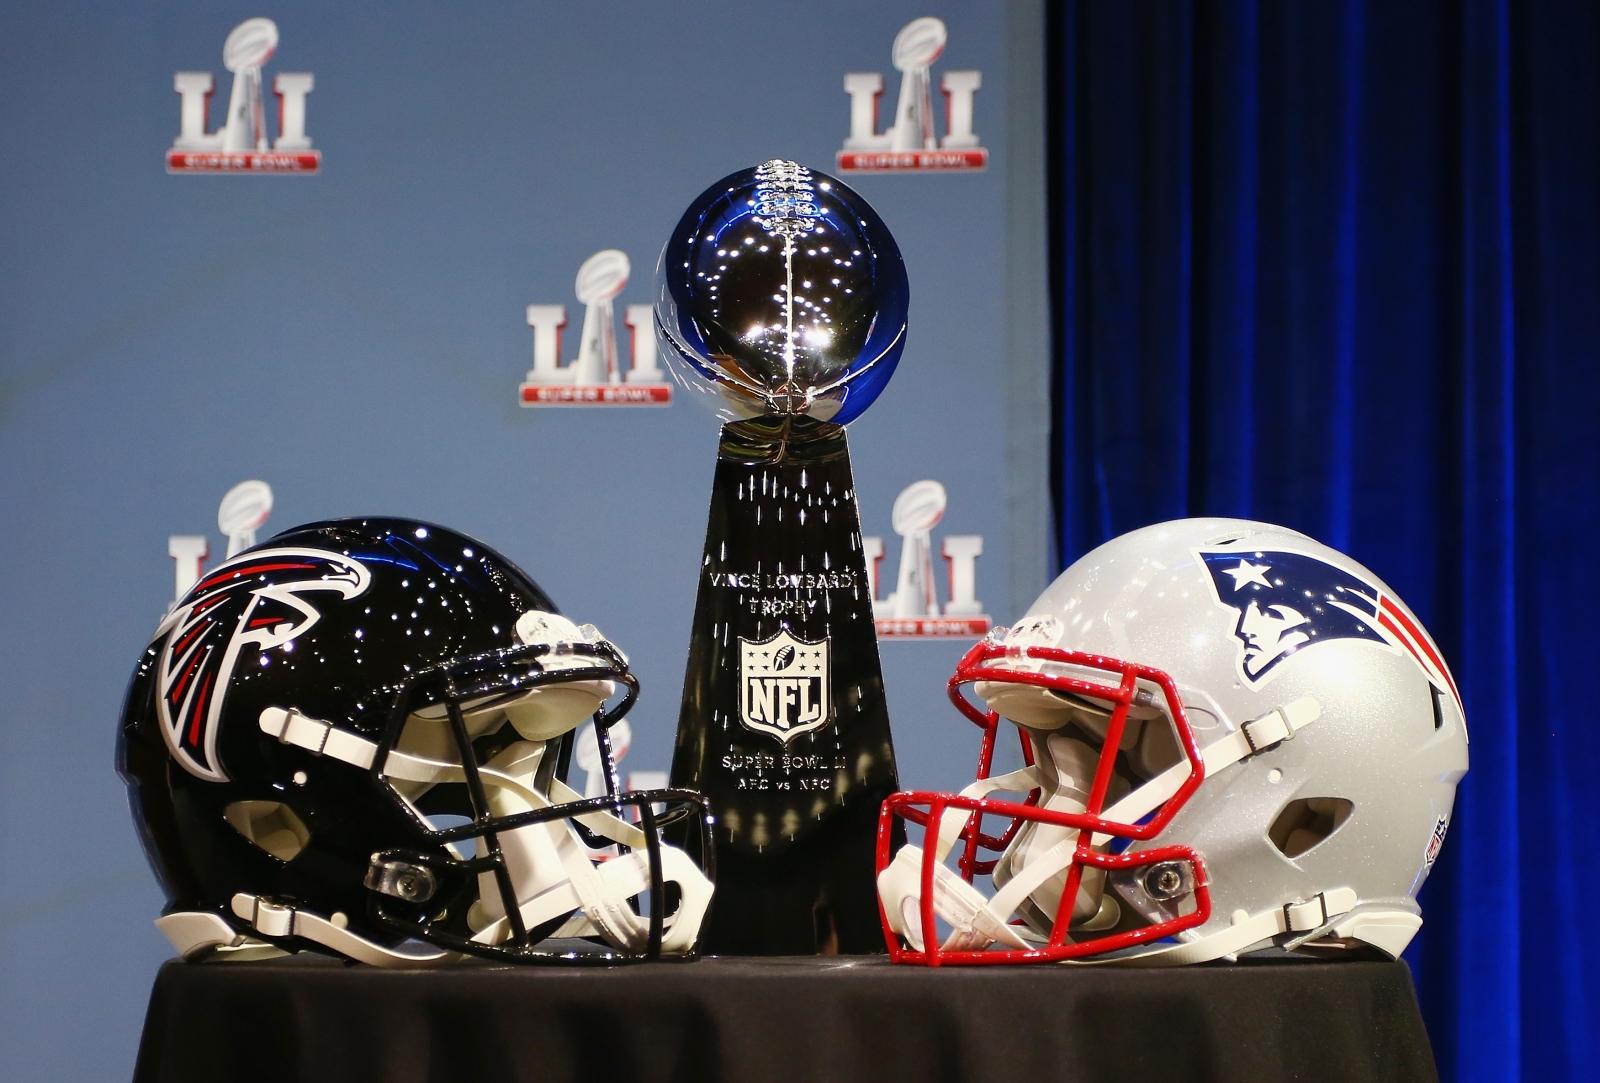 Patriots' comeback lit up New England - literally